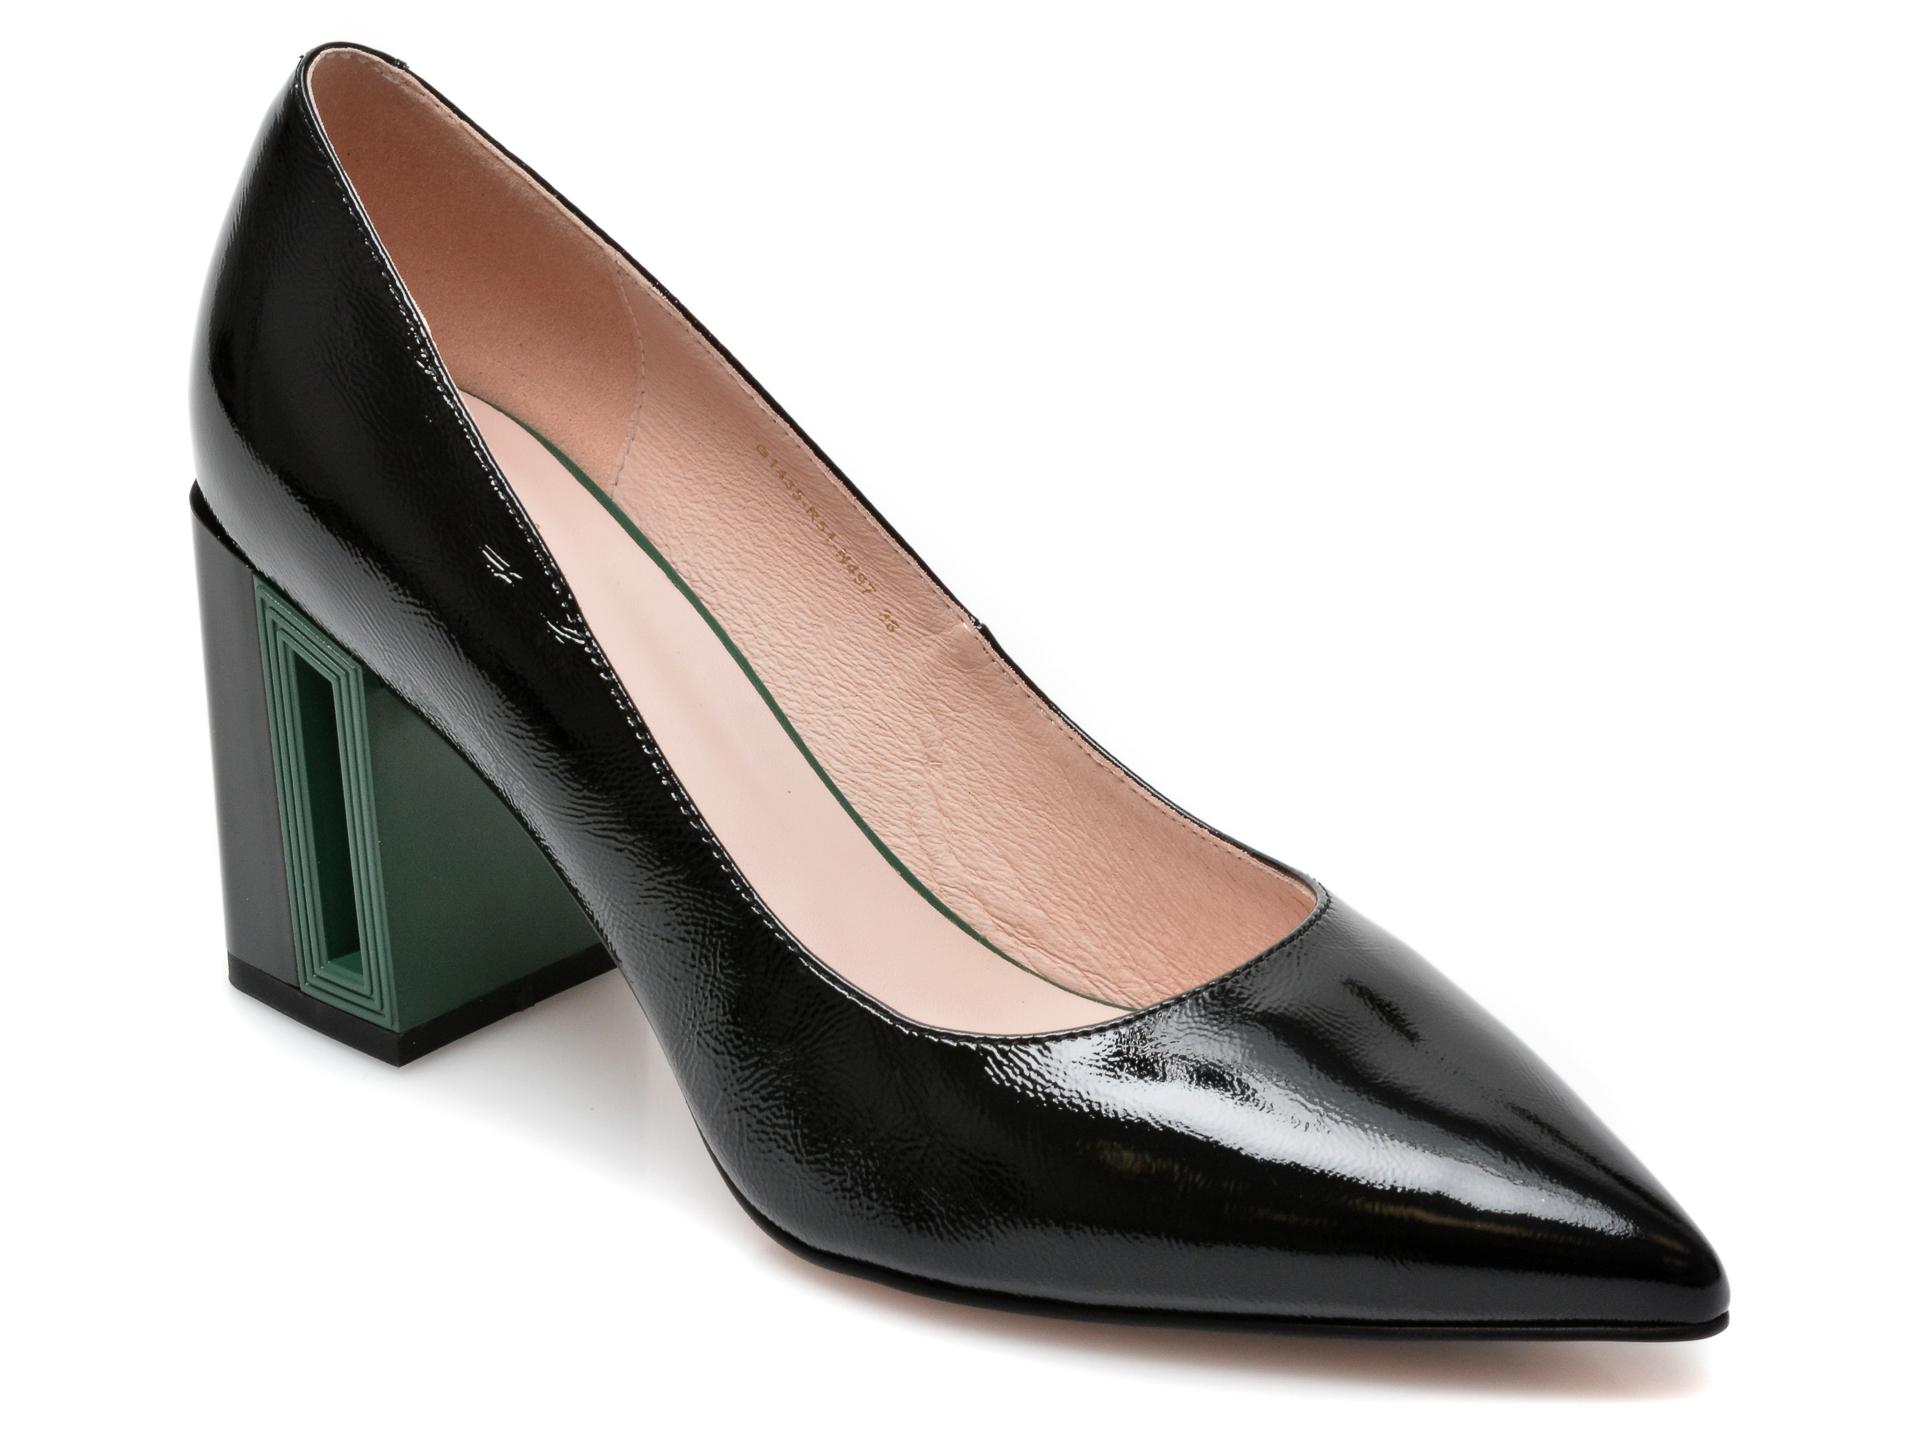 Pantofi FLAVIA PASSINI negri, G1435R5, din piele naturala lacuita